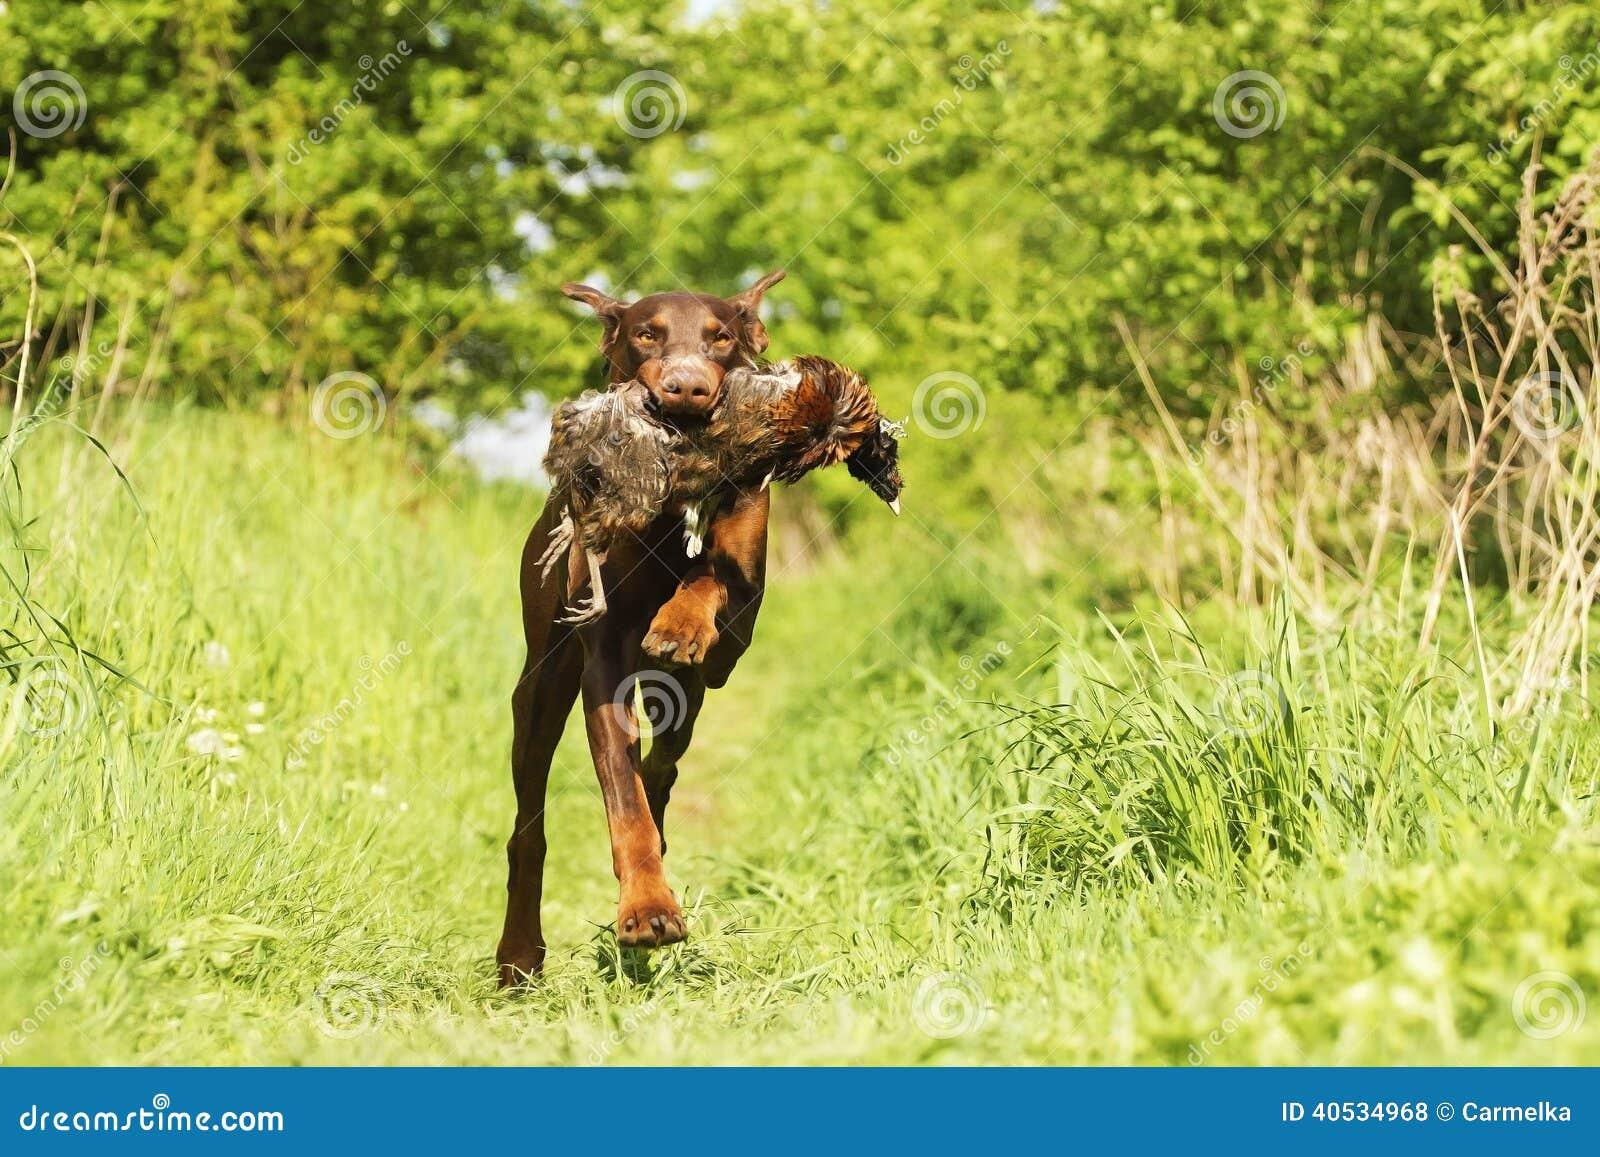 Doberman Dog Review